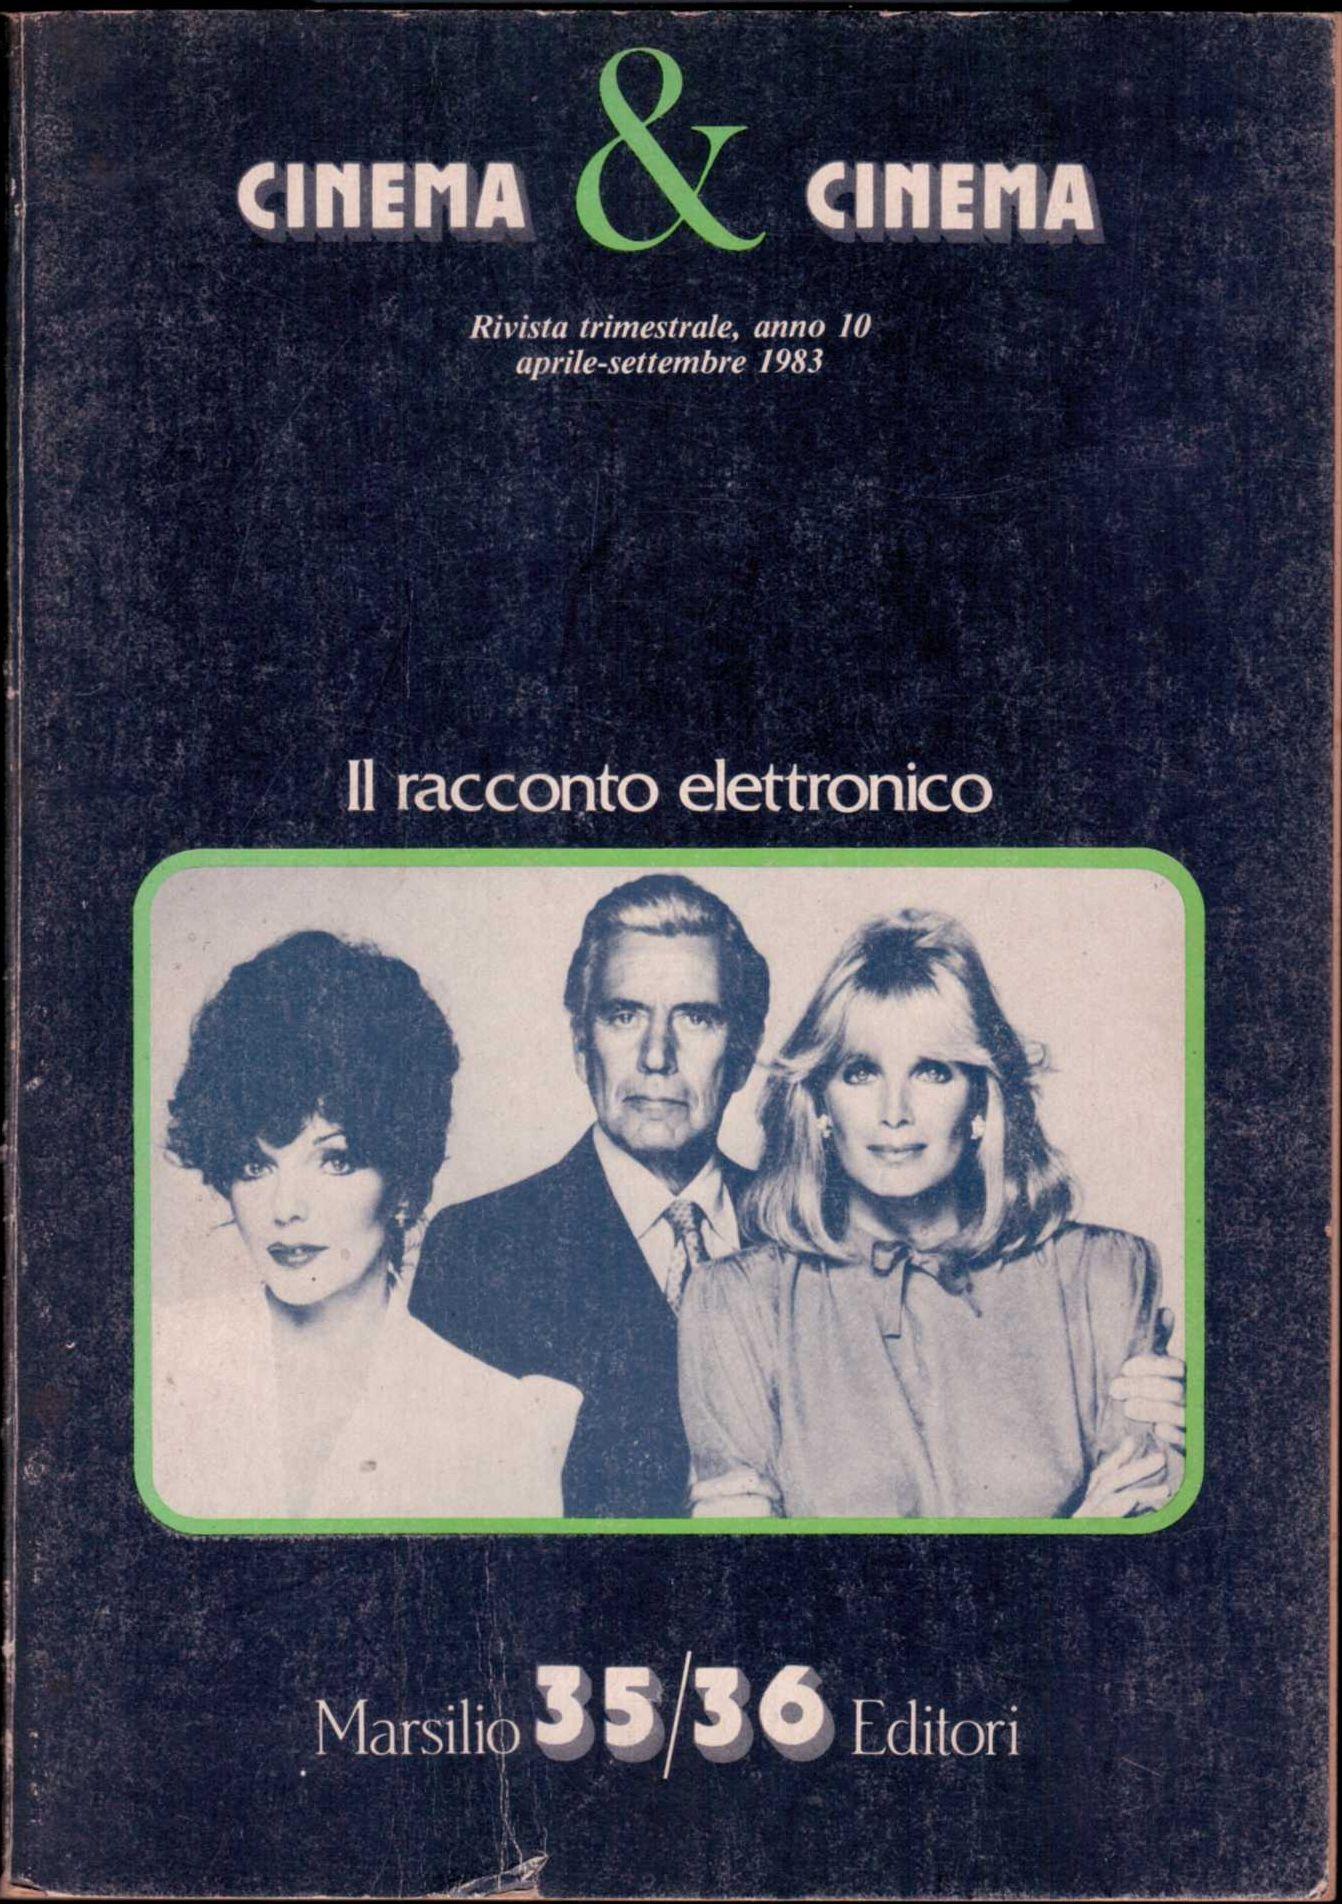 Cinema e cinema, anno 10, n.35-36